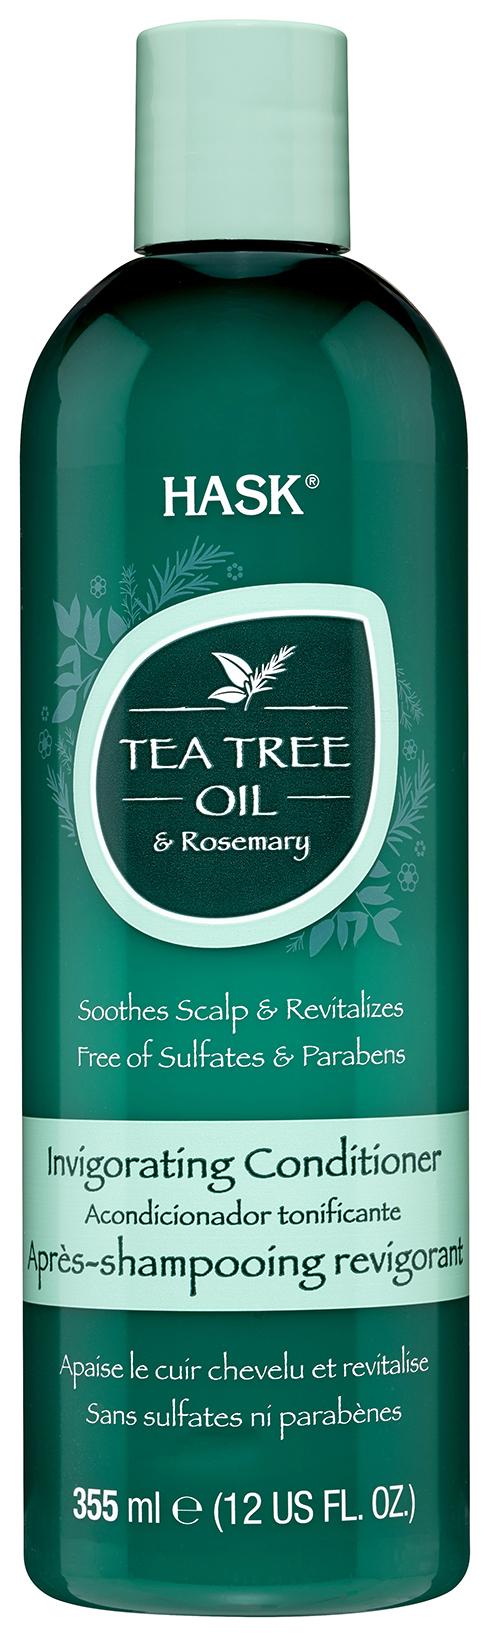 Купить Кондиционер для волос HASK Tee Tree Oil & Rosemary 355 мл